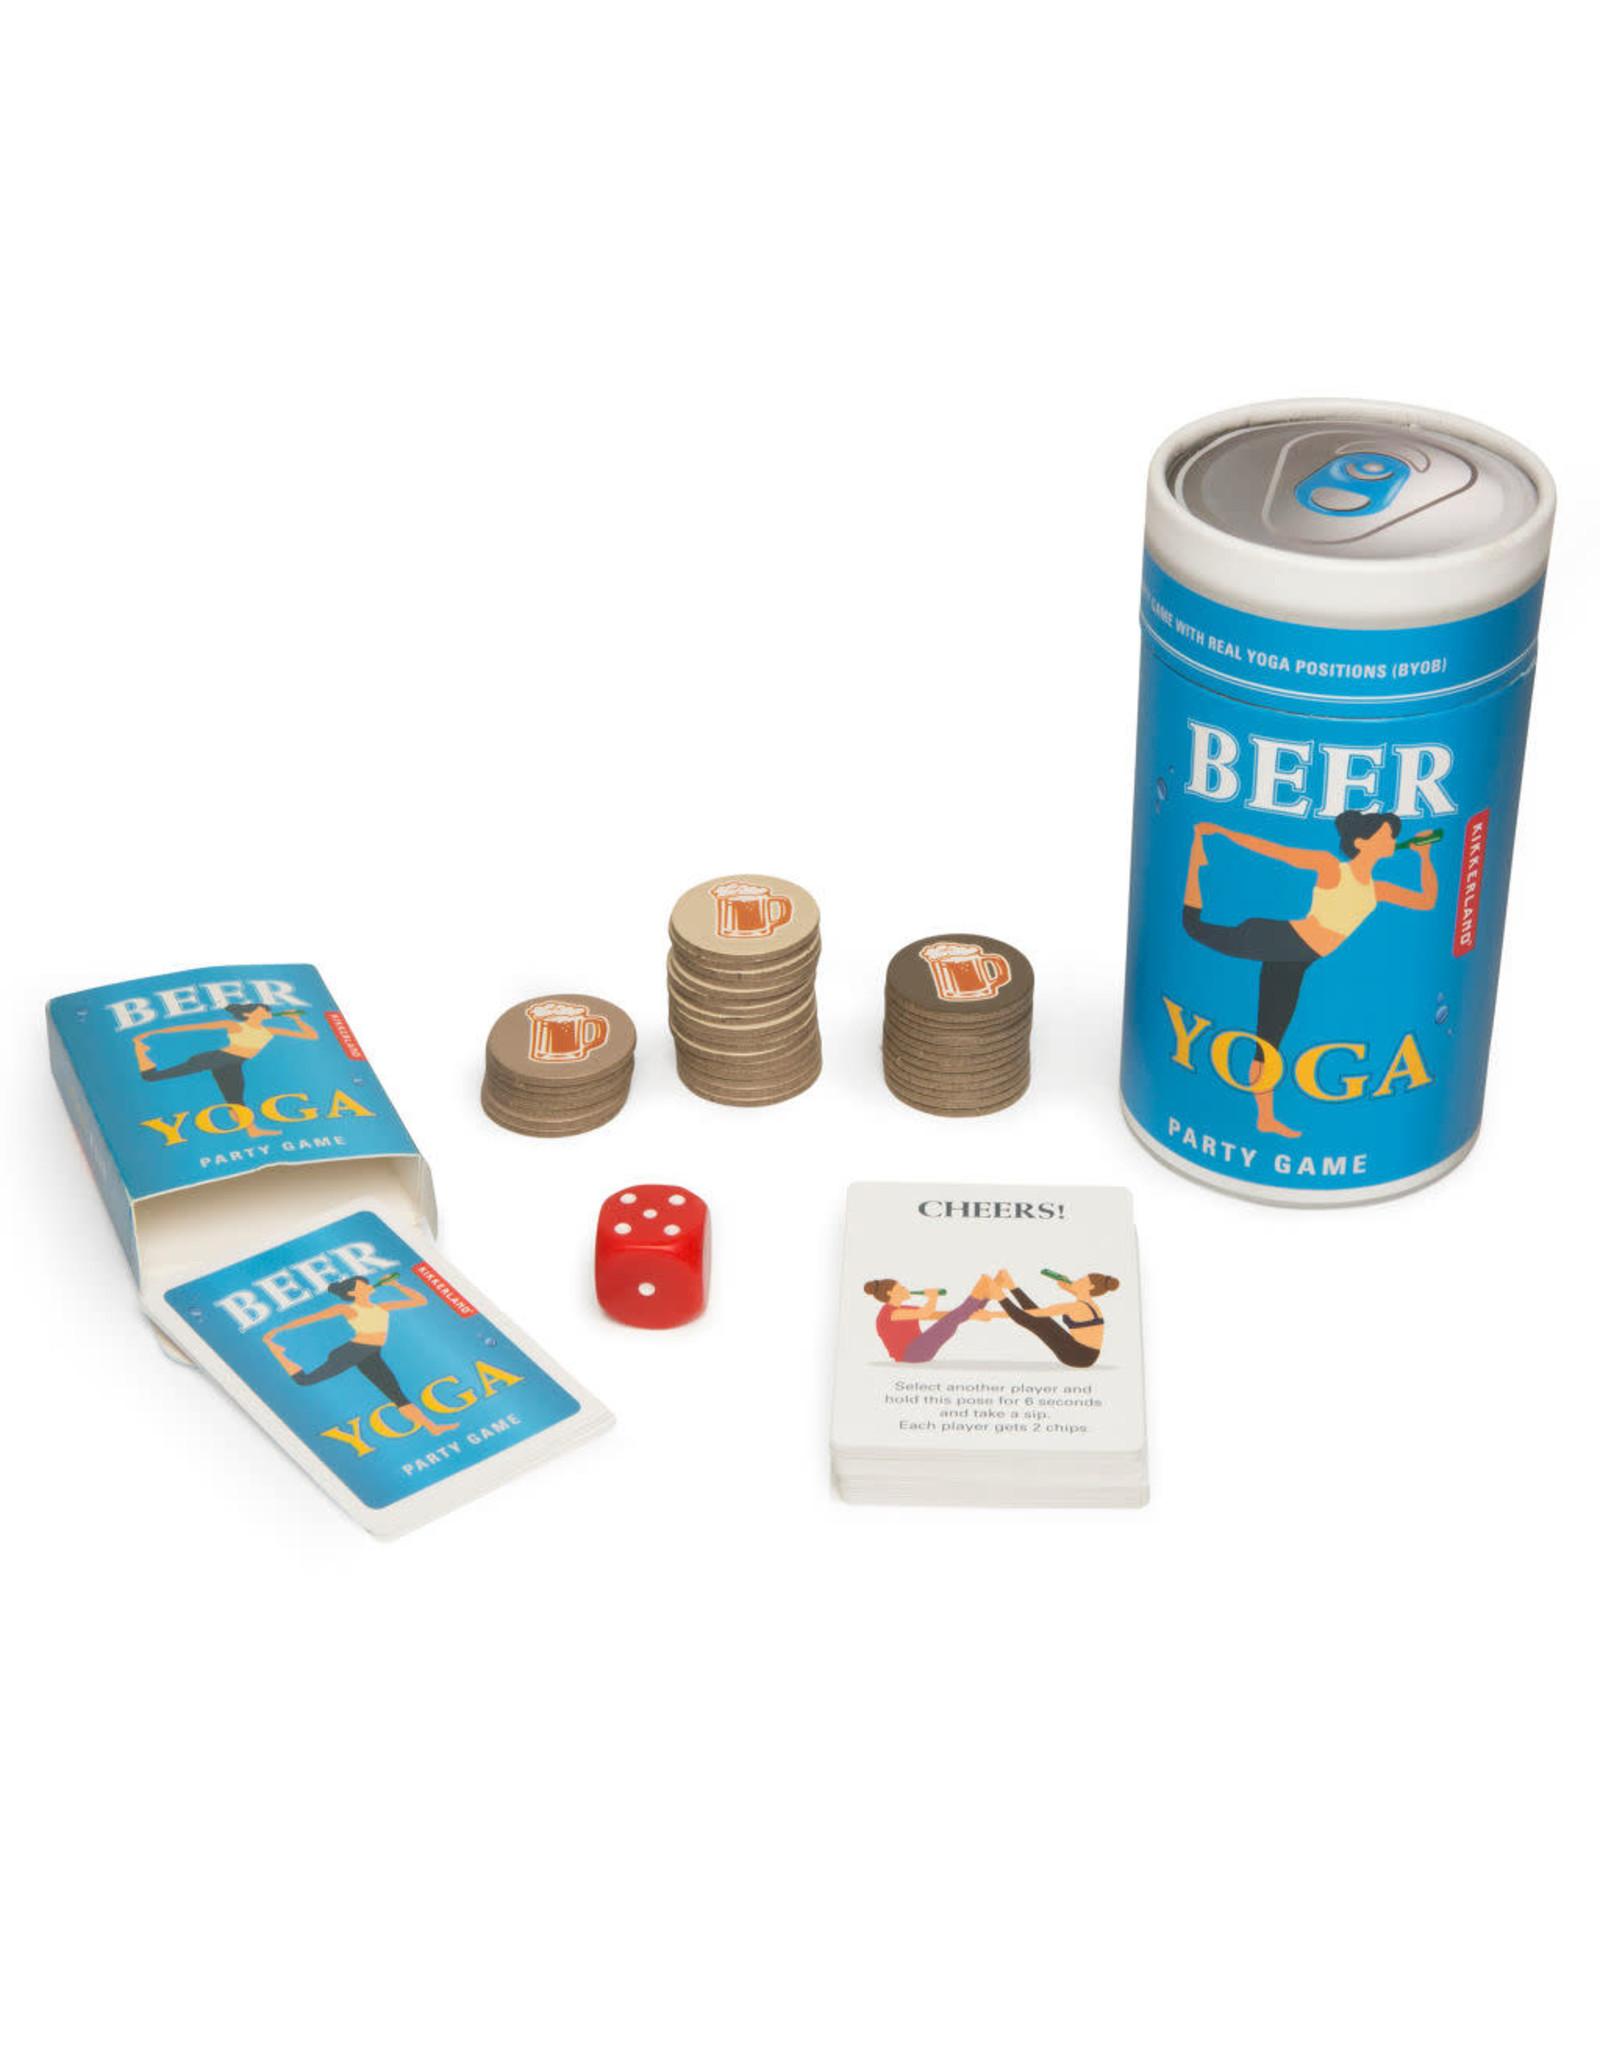 Beer Yoga game